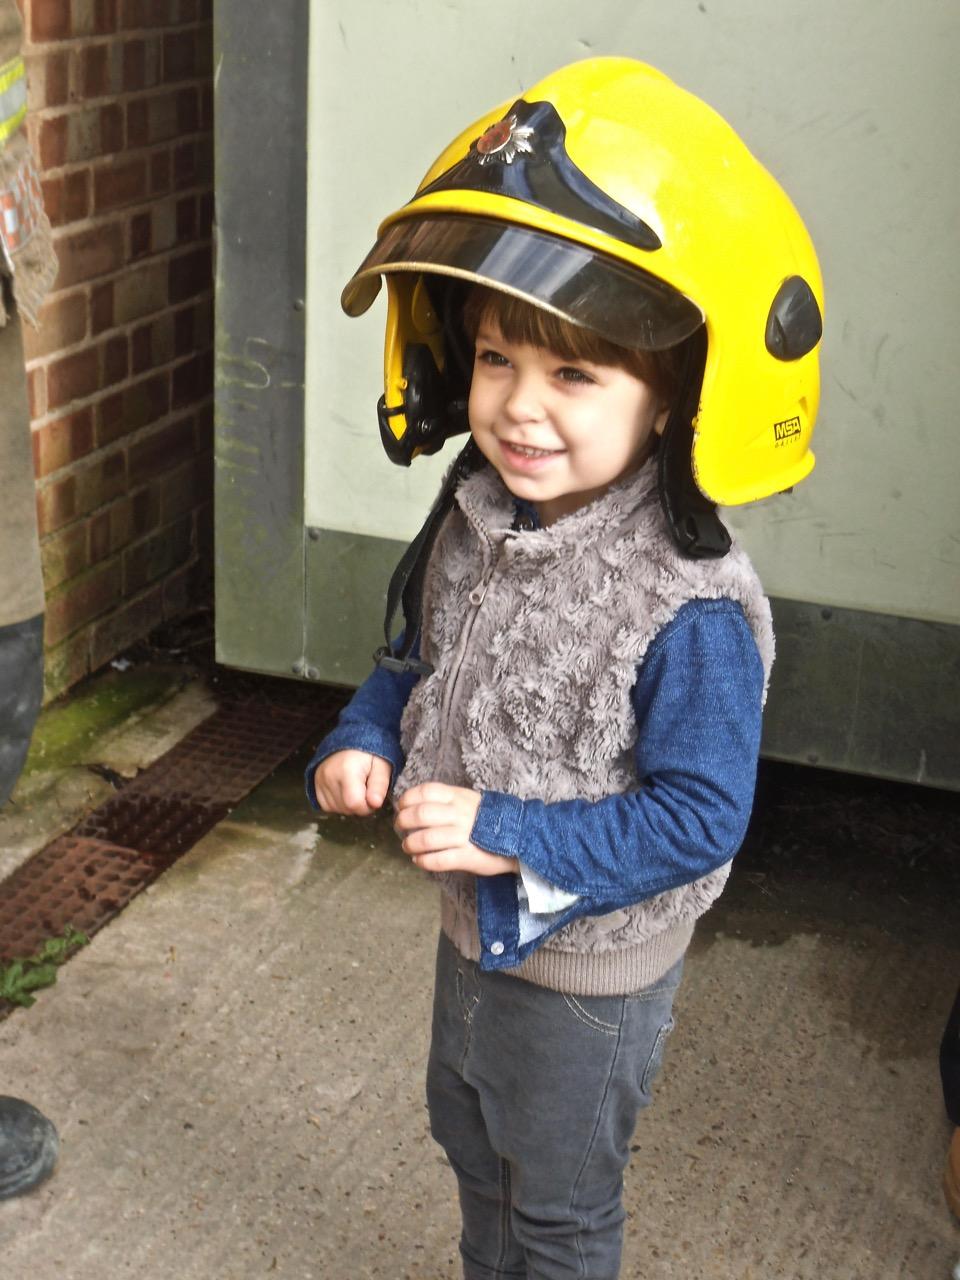 police fireman dentist - 14.jpg